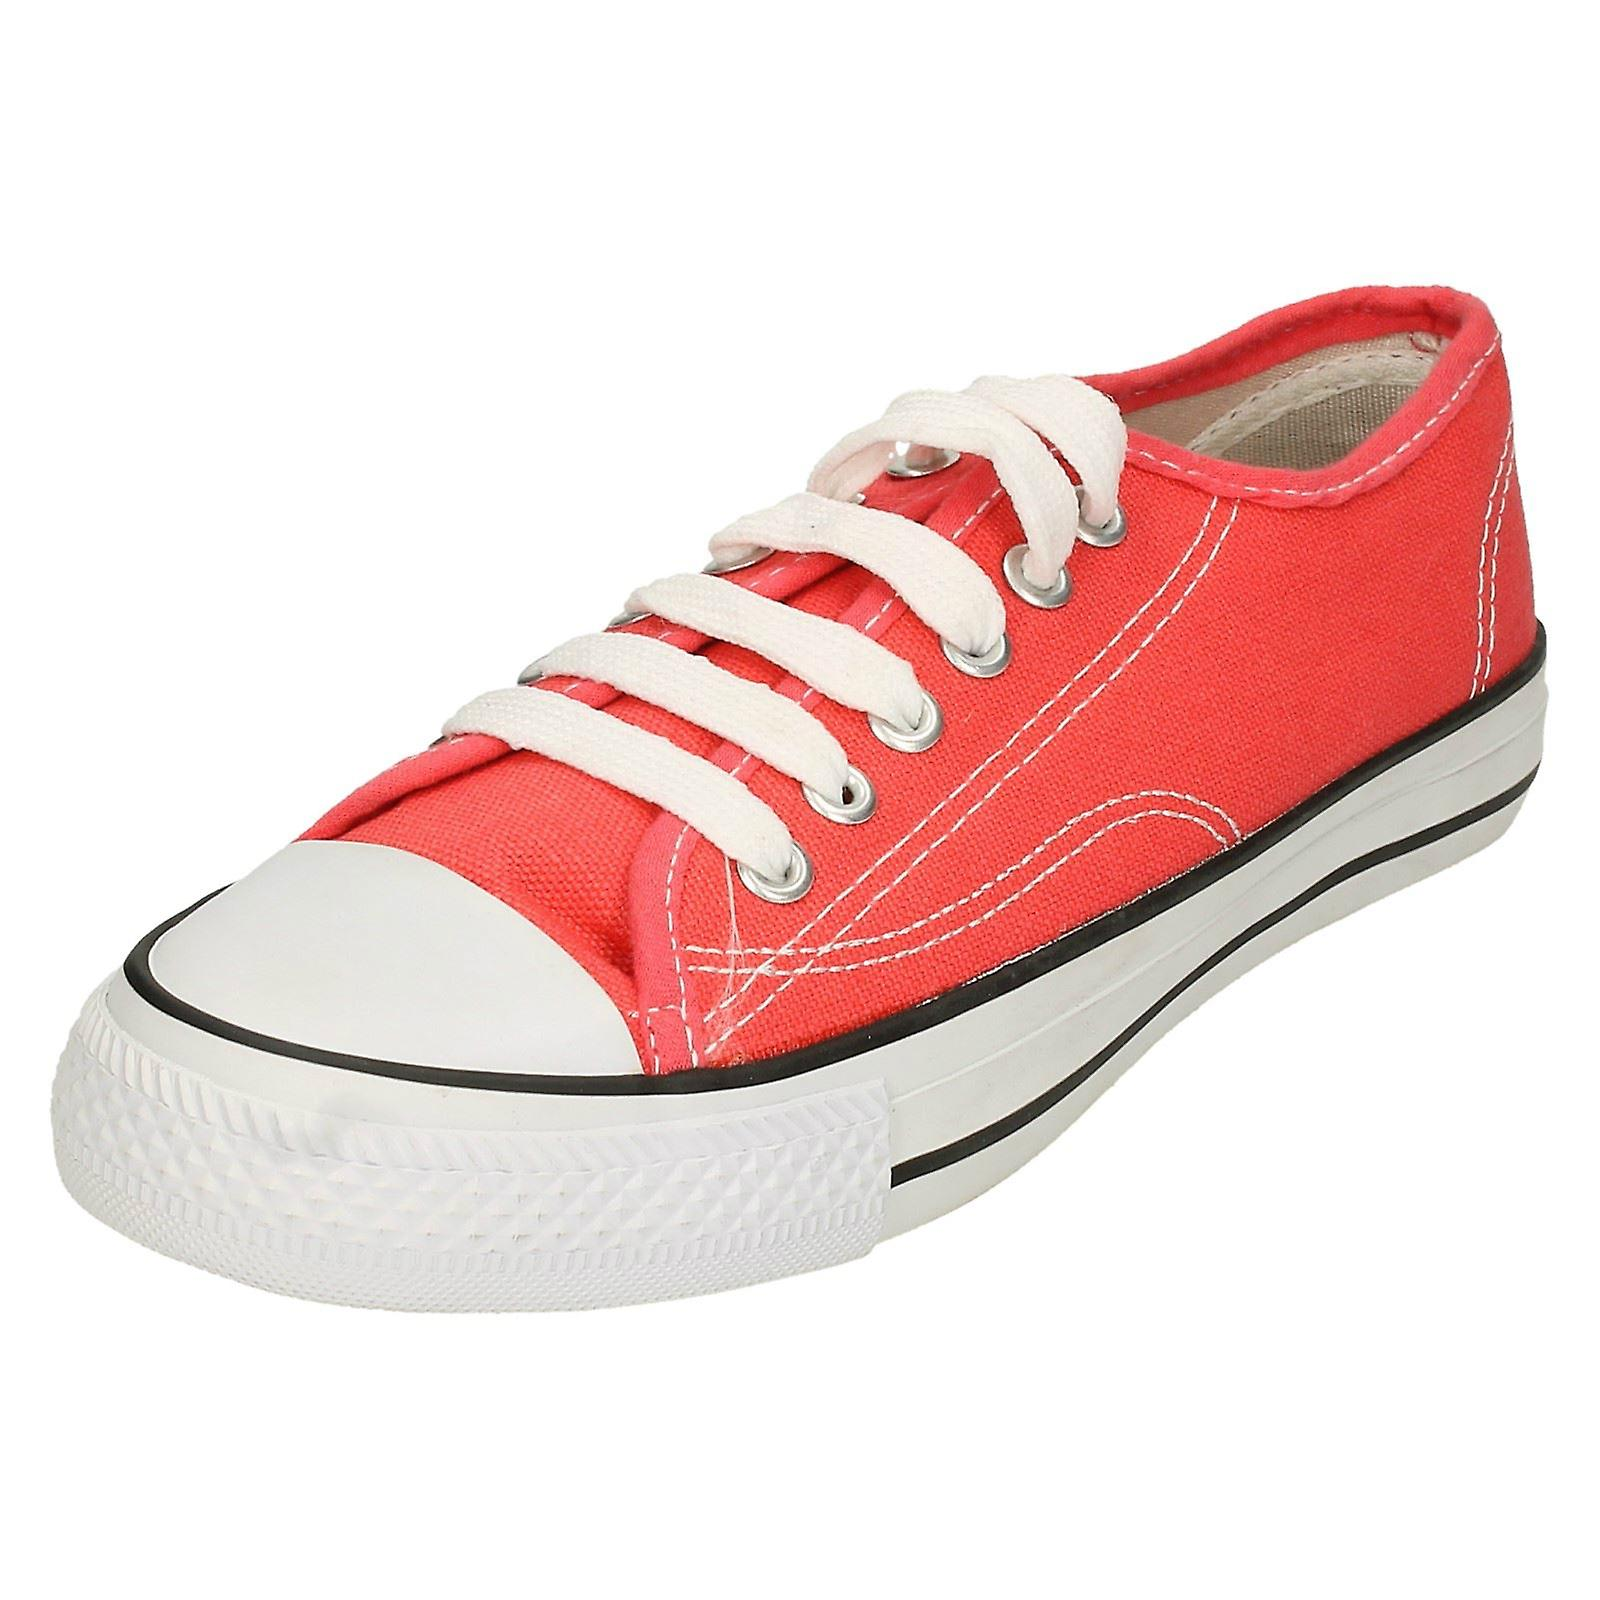 Womens Spot su tela pizzo scarpe X0001